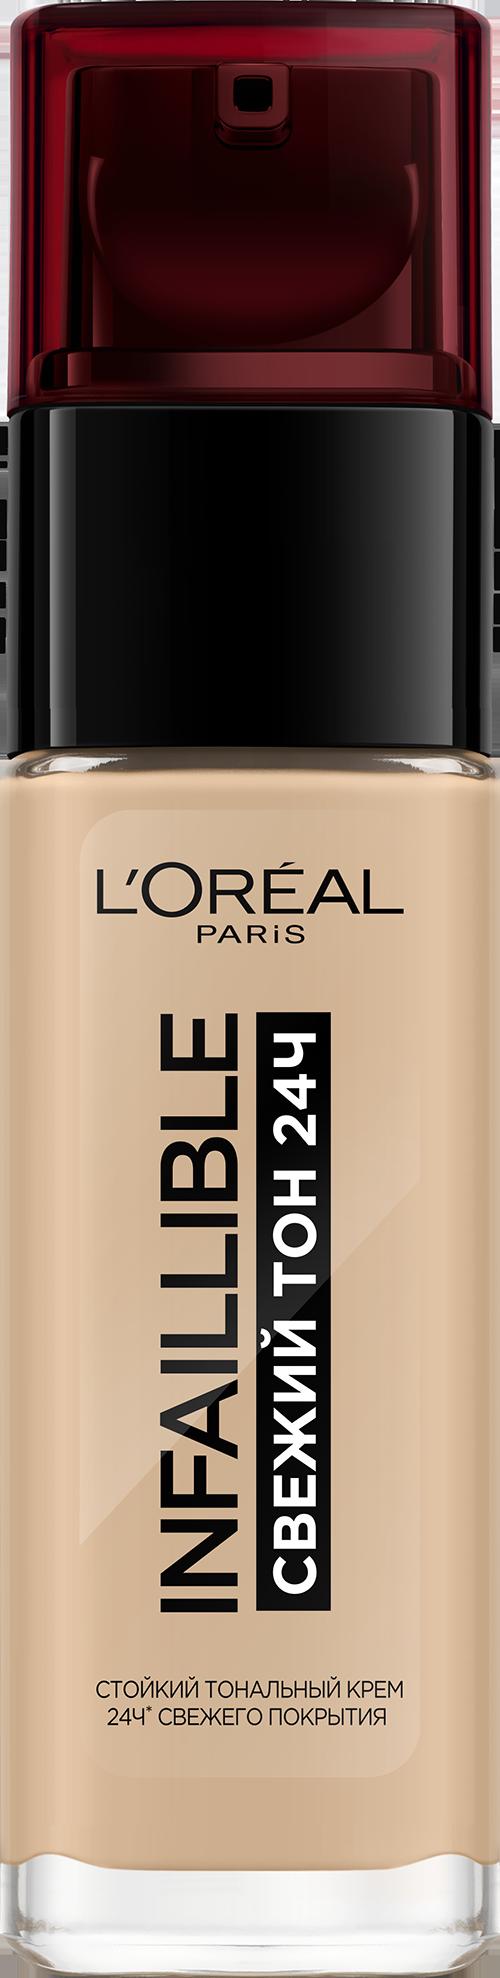 Тональный крем L'Oreal Paris Infallible 24h Stay Fresh Foundation 125 30 мл Розовый фото